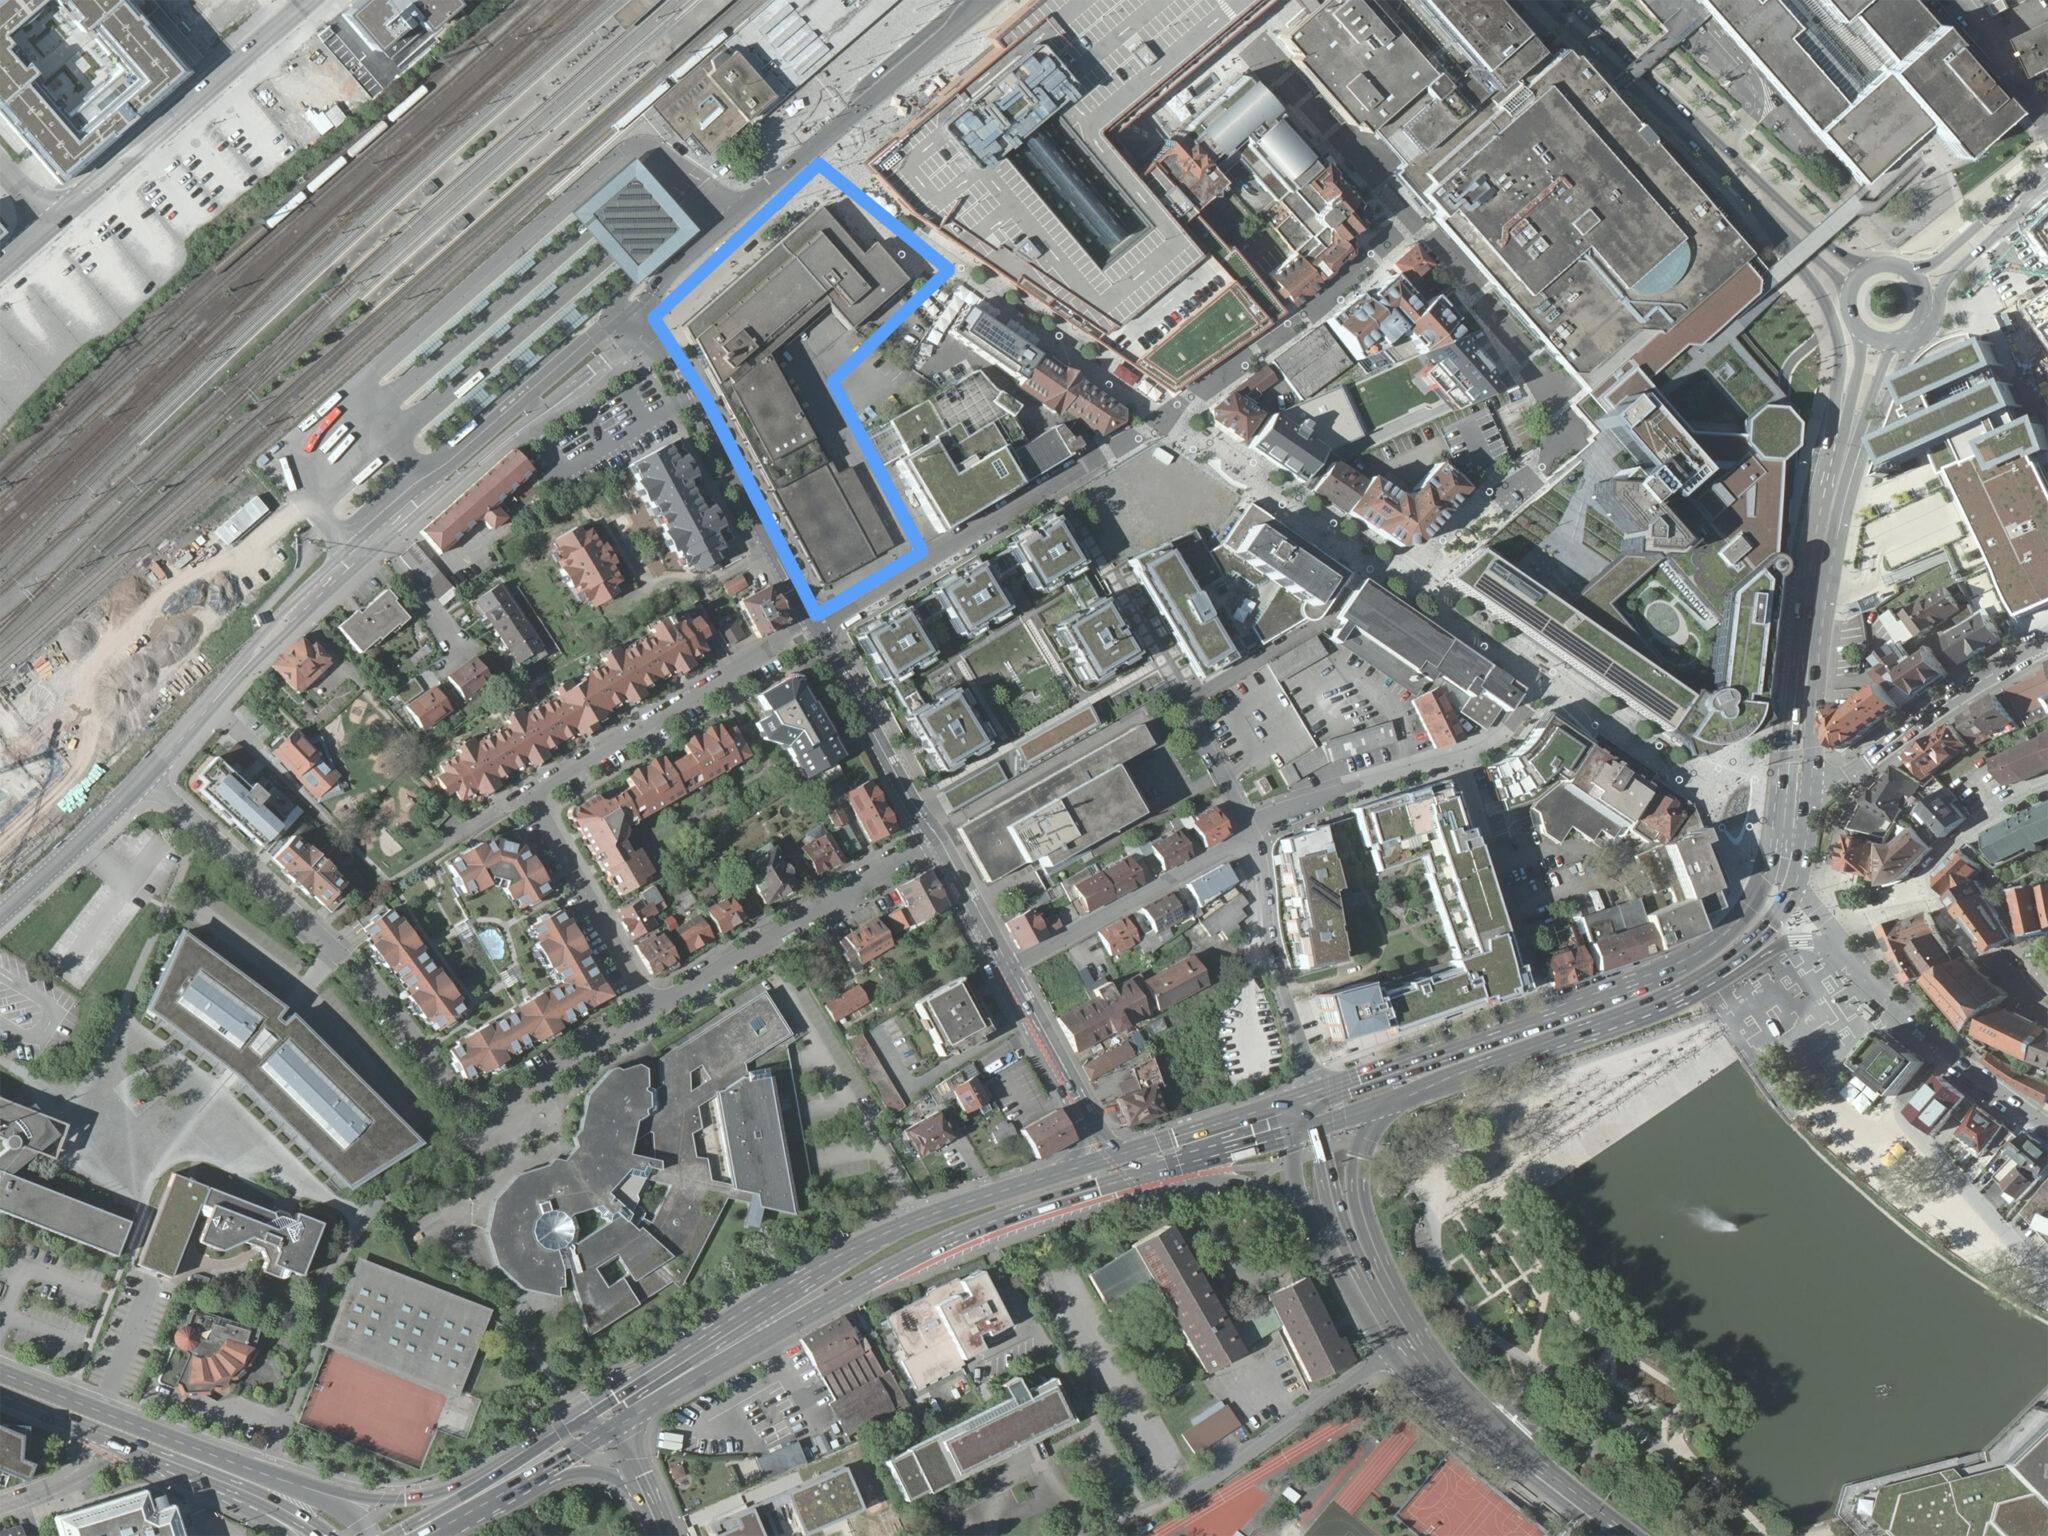 Luftbild_Postareal_Boeblingen